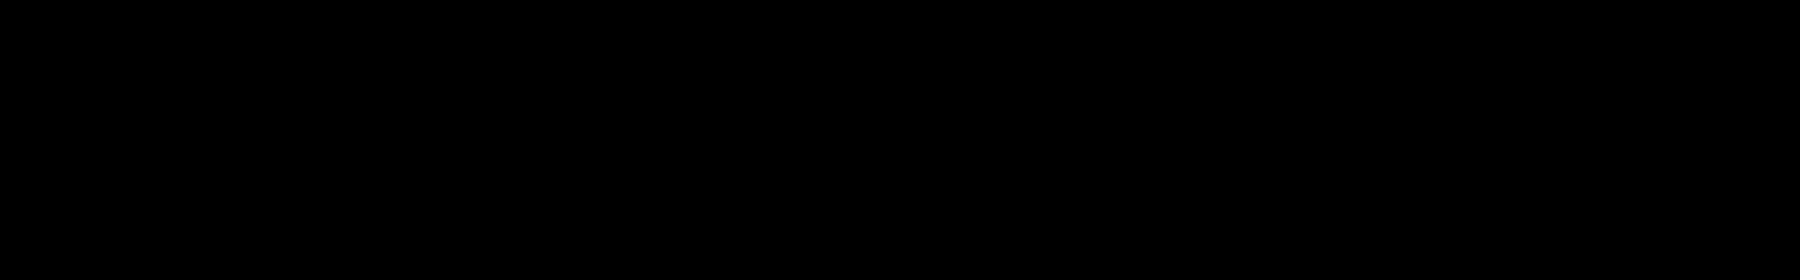 VIRUS TI TECHNO audio waveform